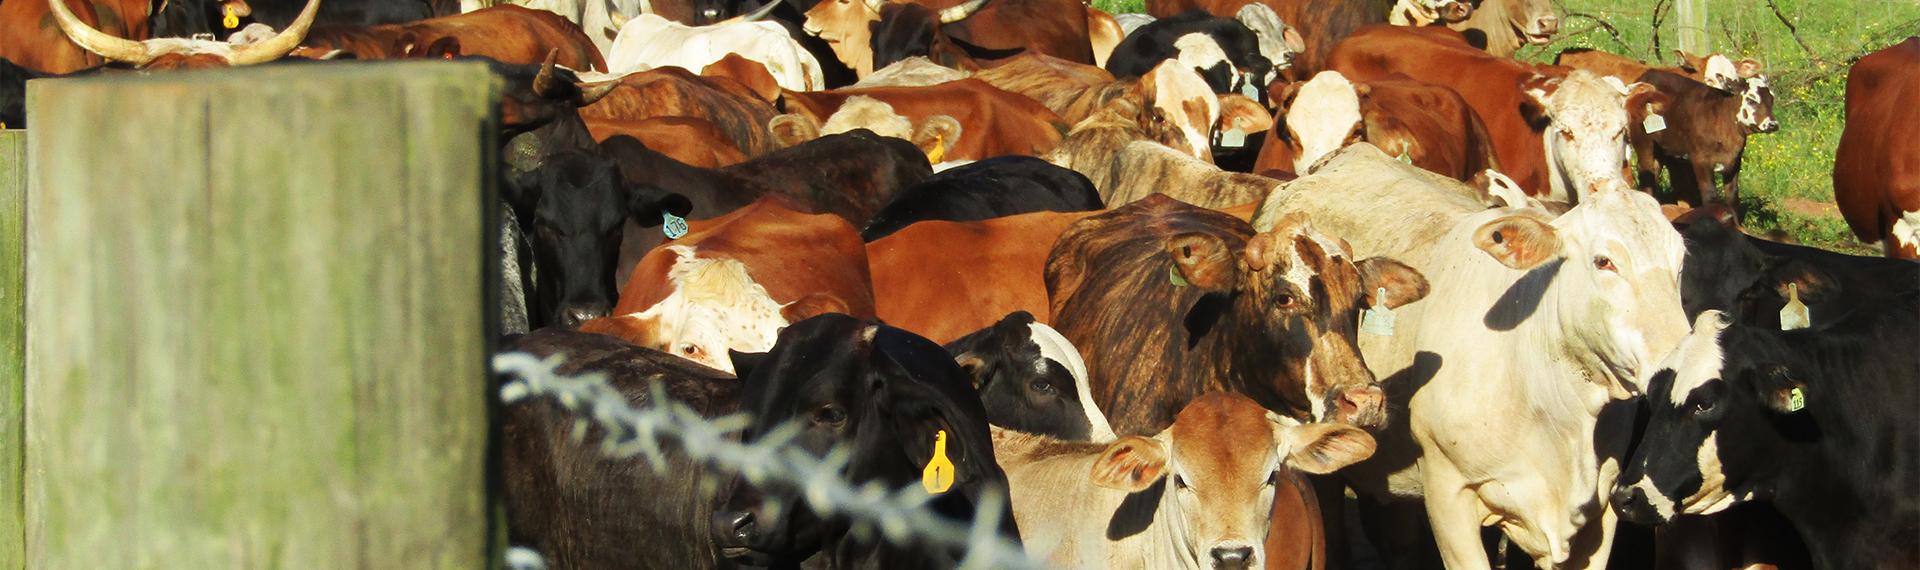 SBDC Cattle Ranch slider